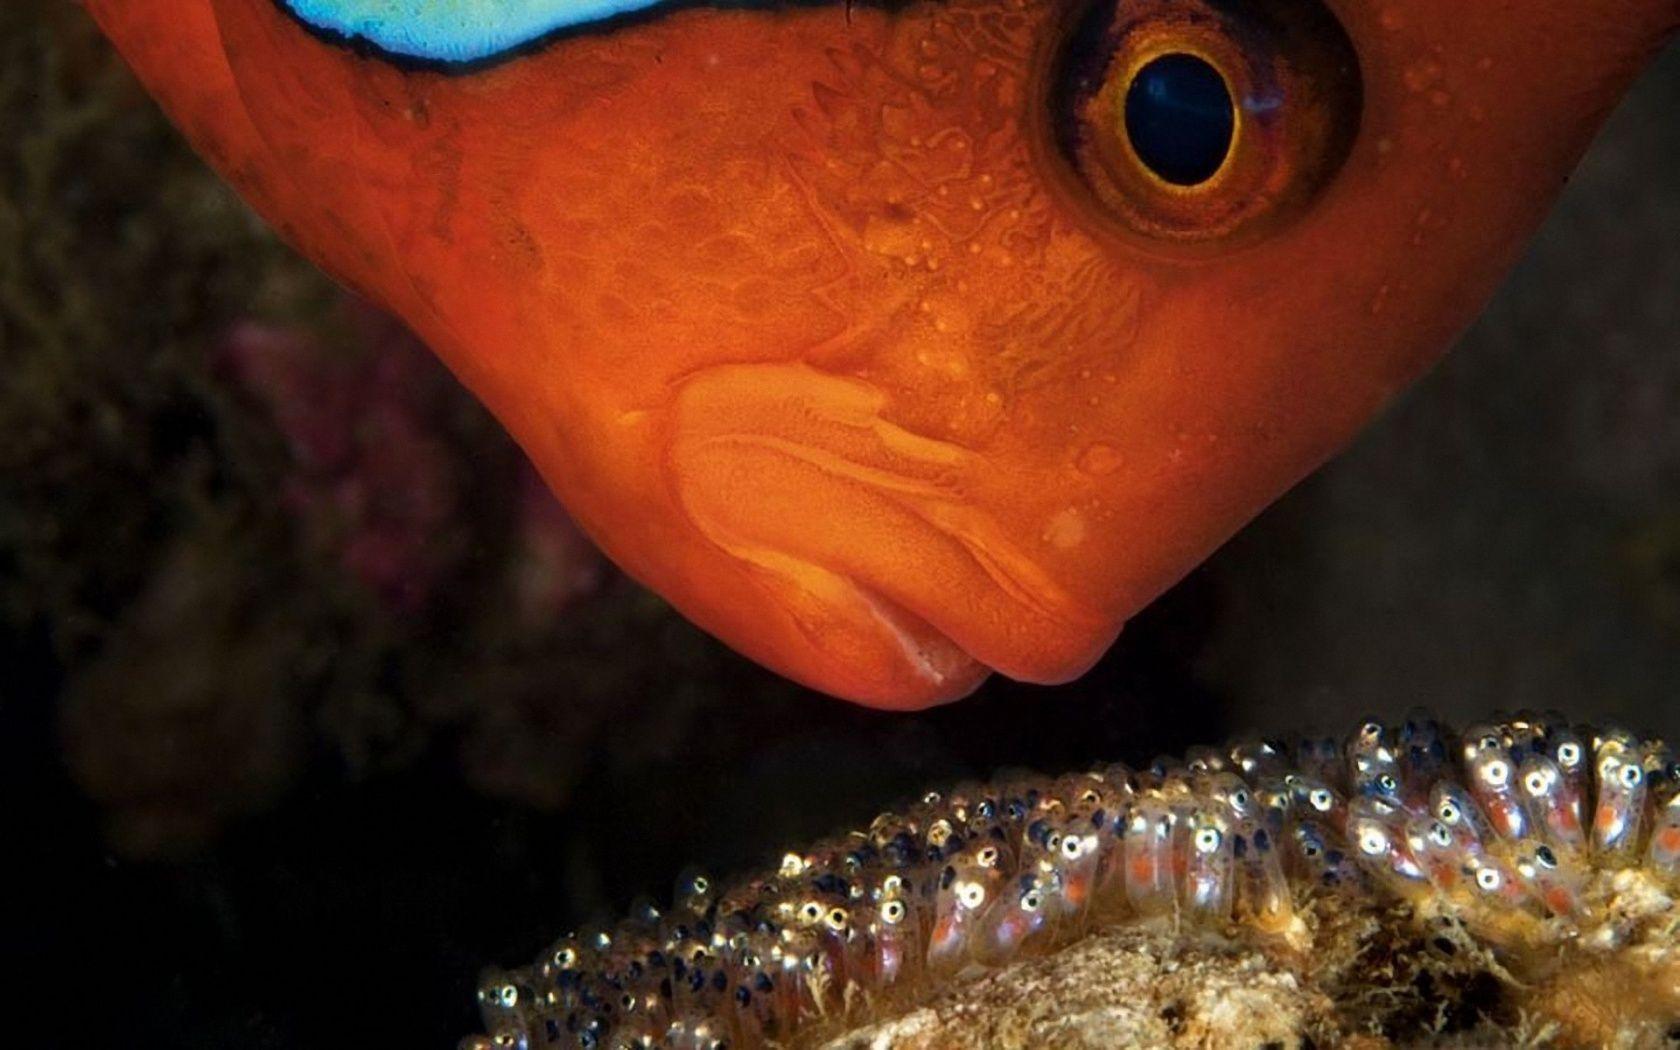 1680x1050 Gold Fish desktop PC and Mac wallpaper | Fish | Pinterest ...